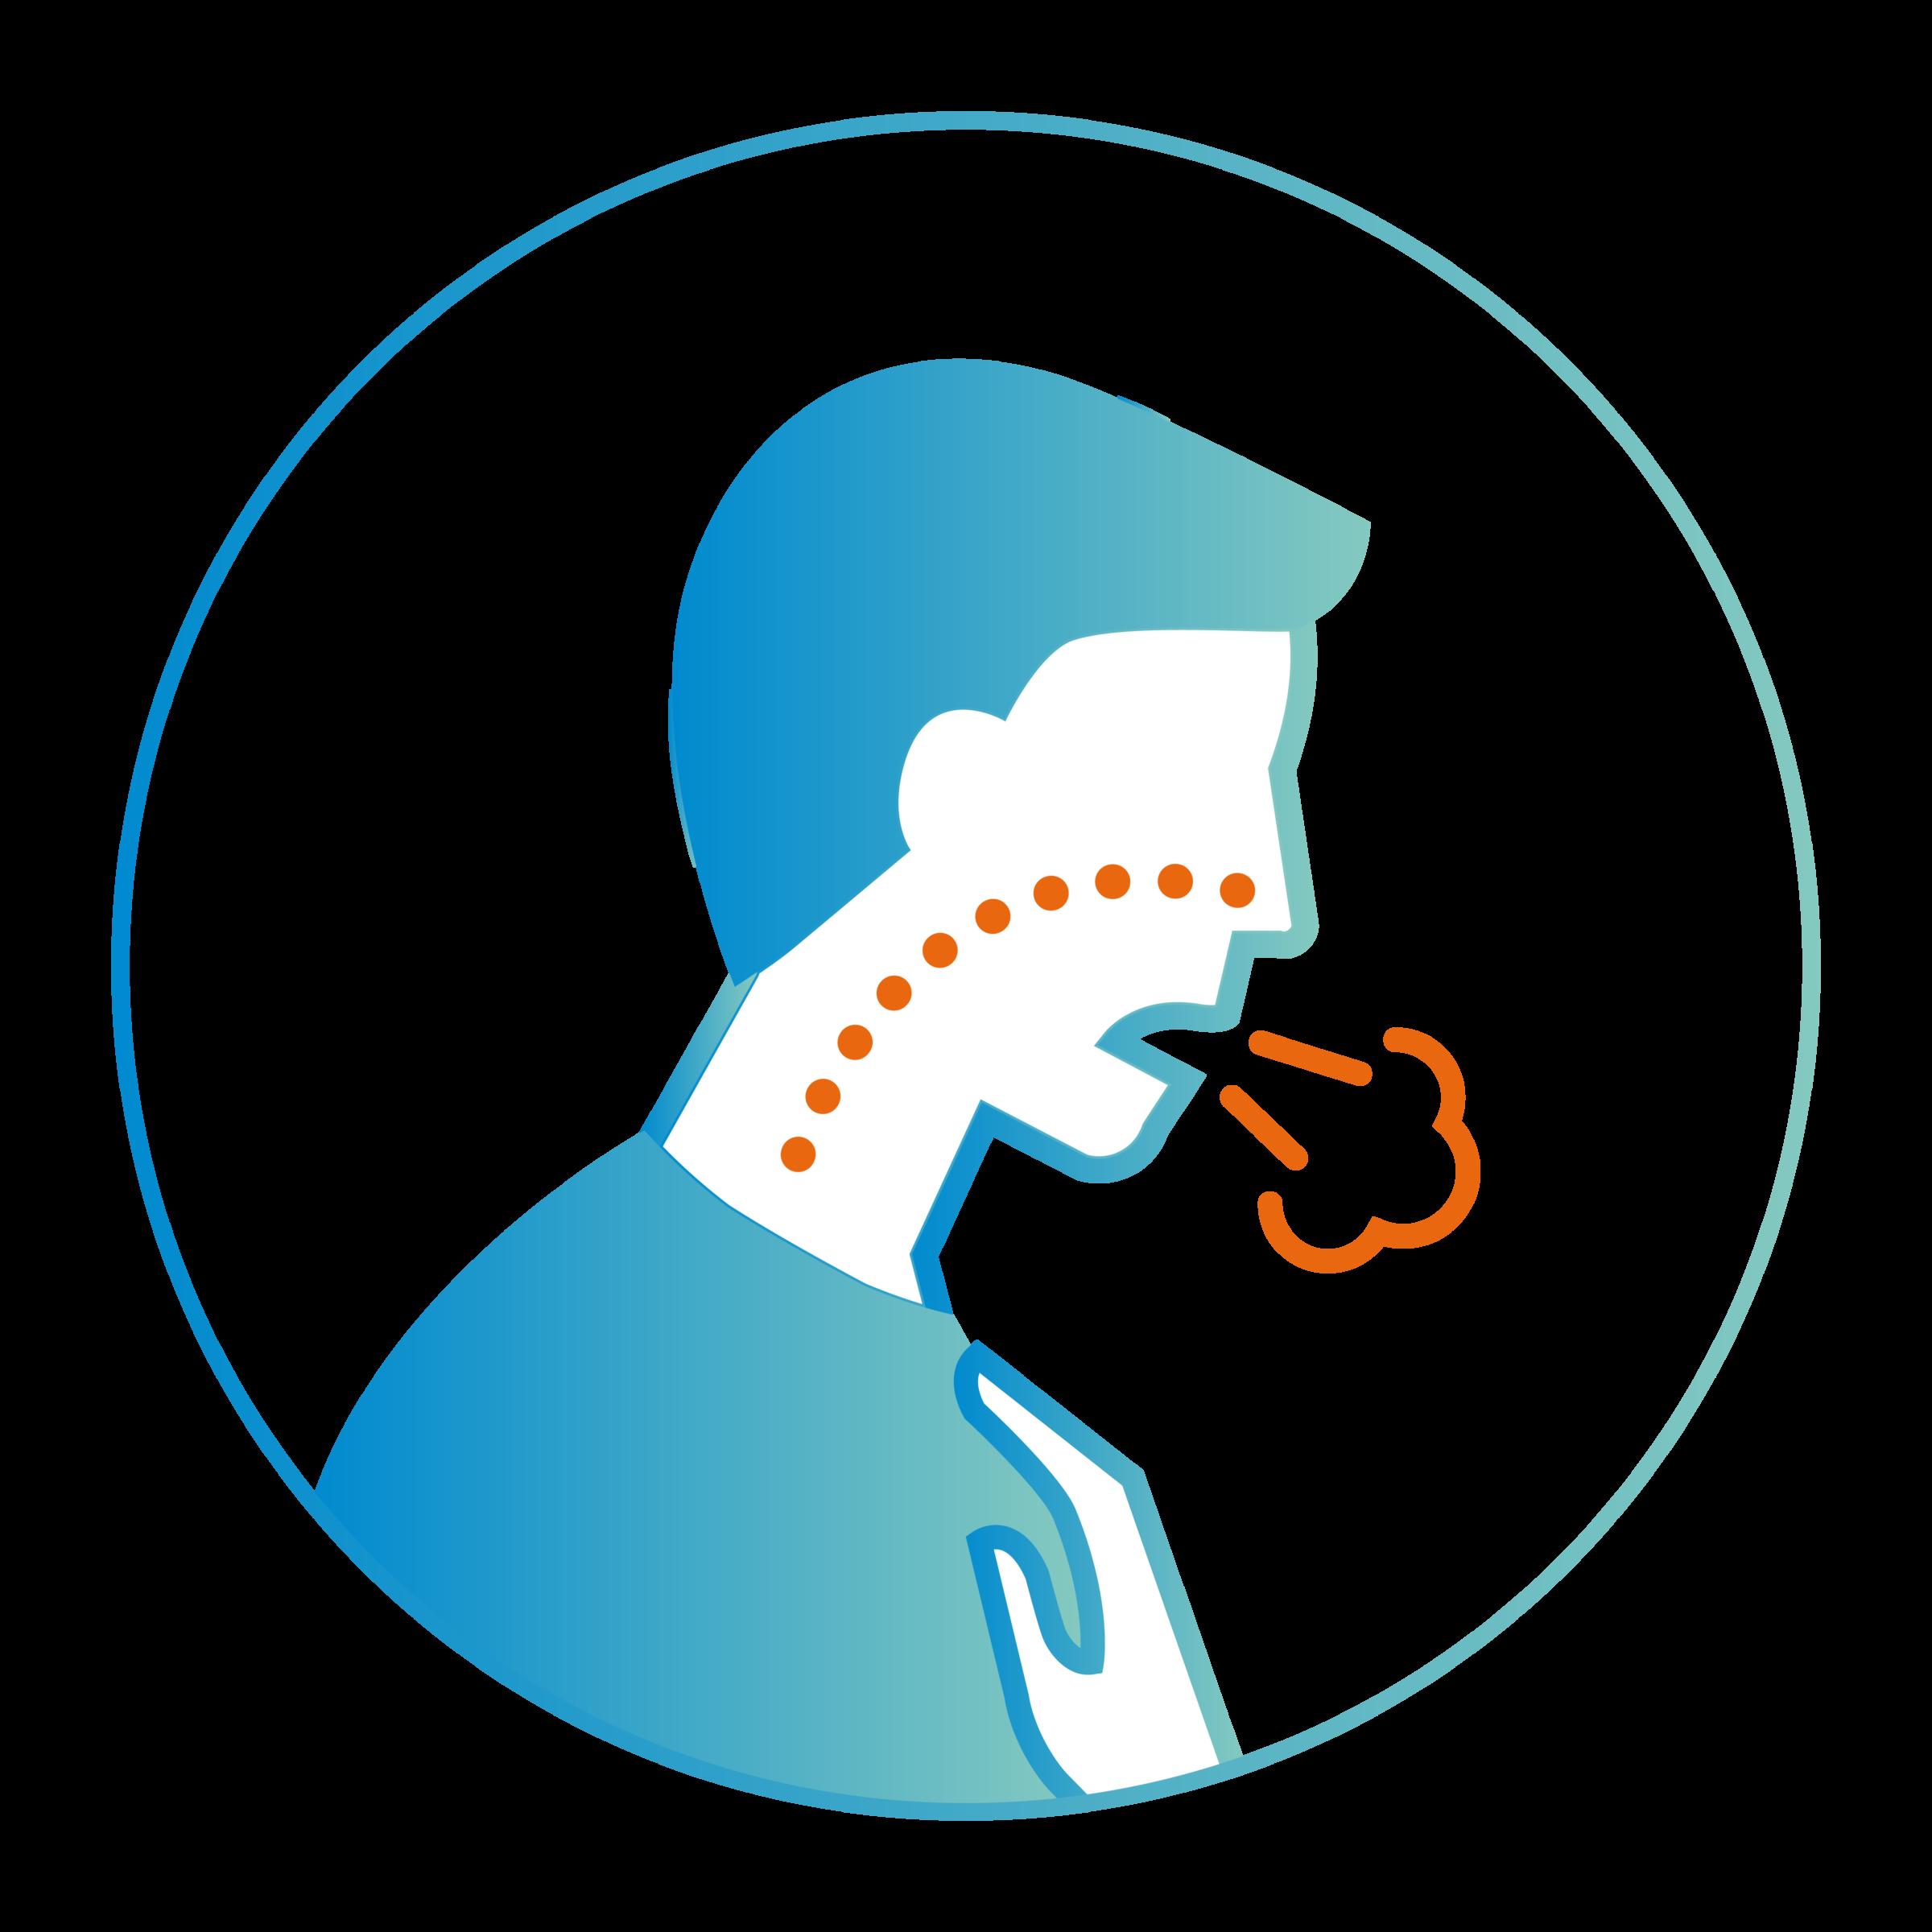 Symptômes coronavirus : difficultés respiratoires